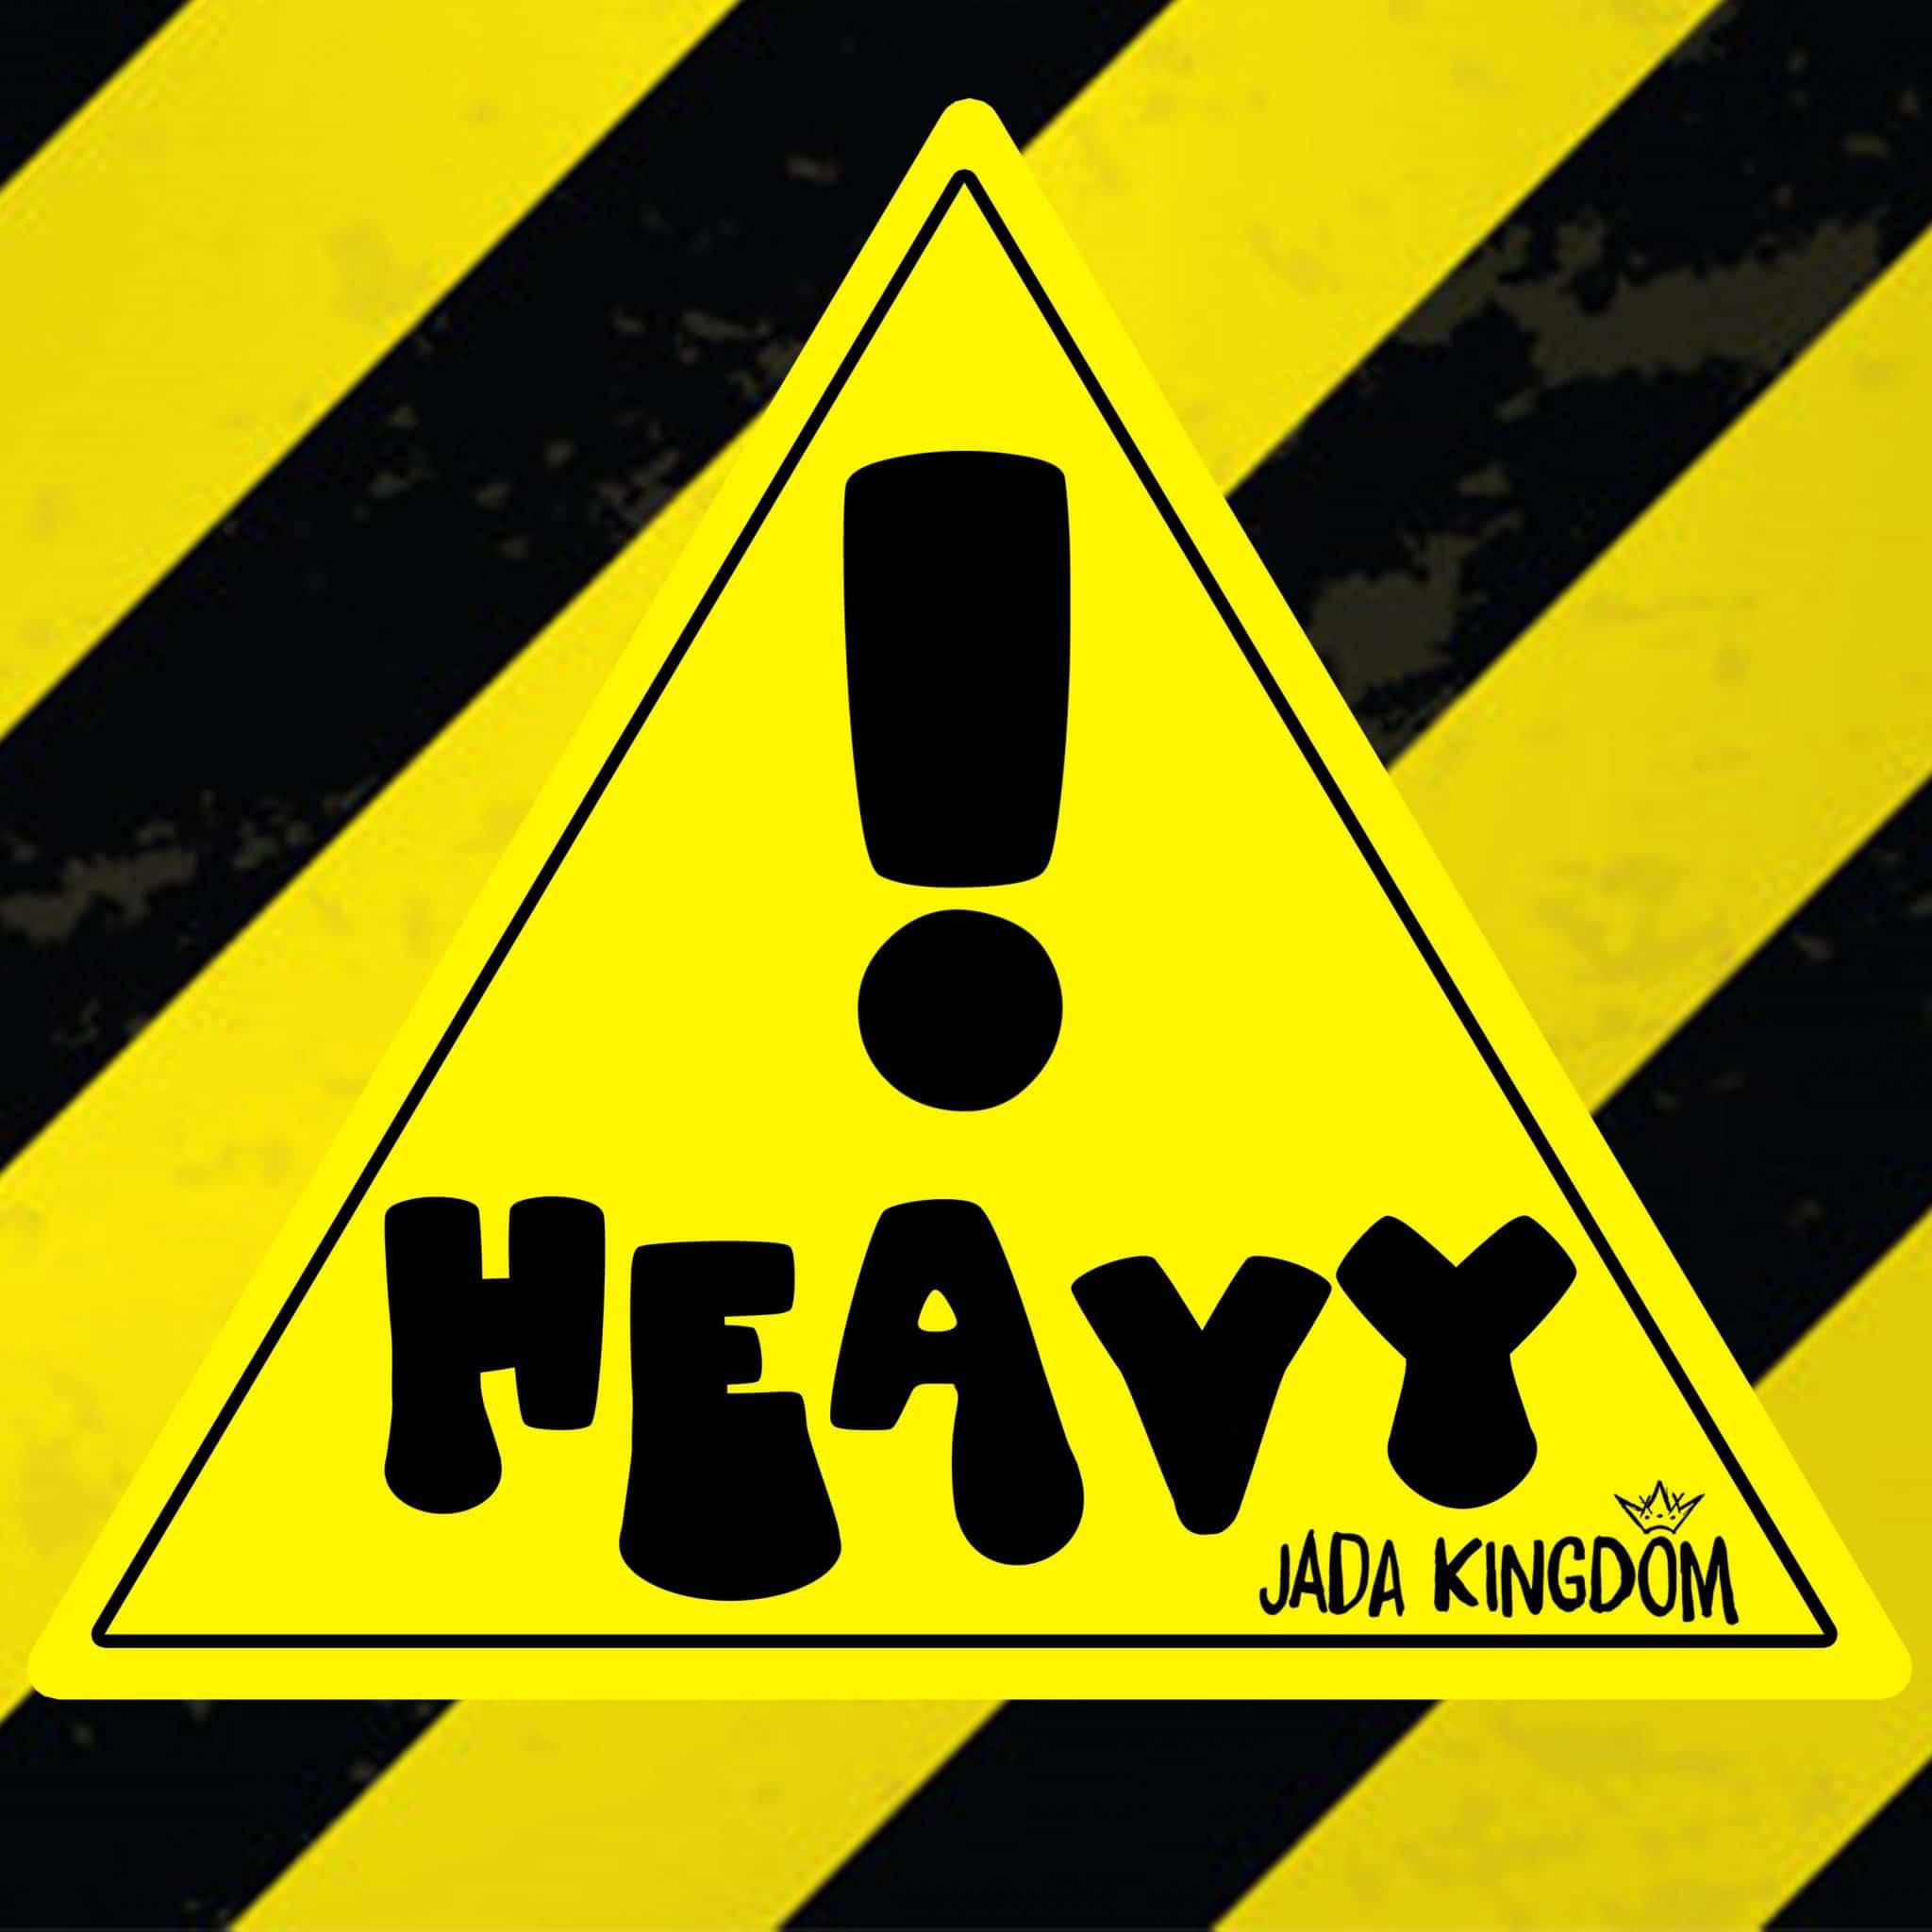 Jada Kingdom - Heavy! - Twinkle Media - Pop Style Music